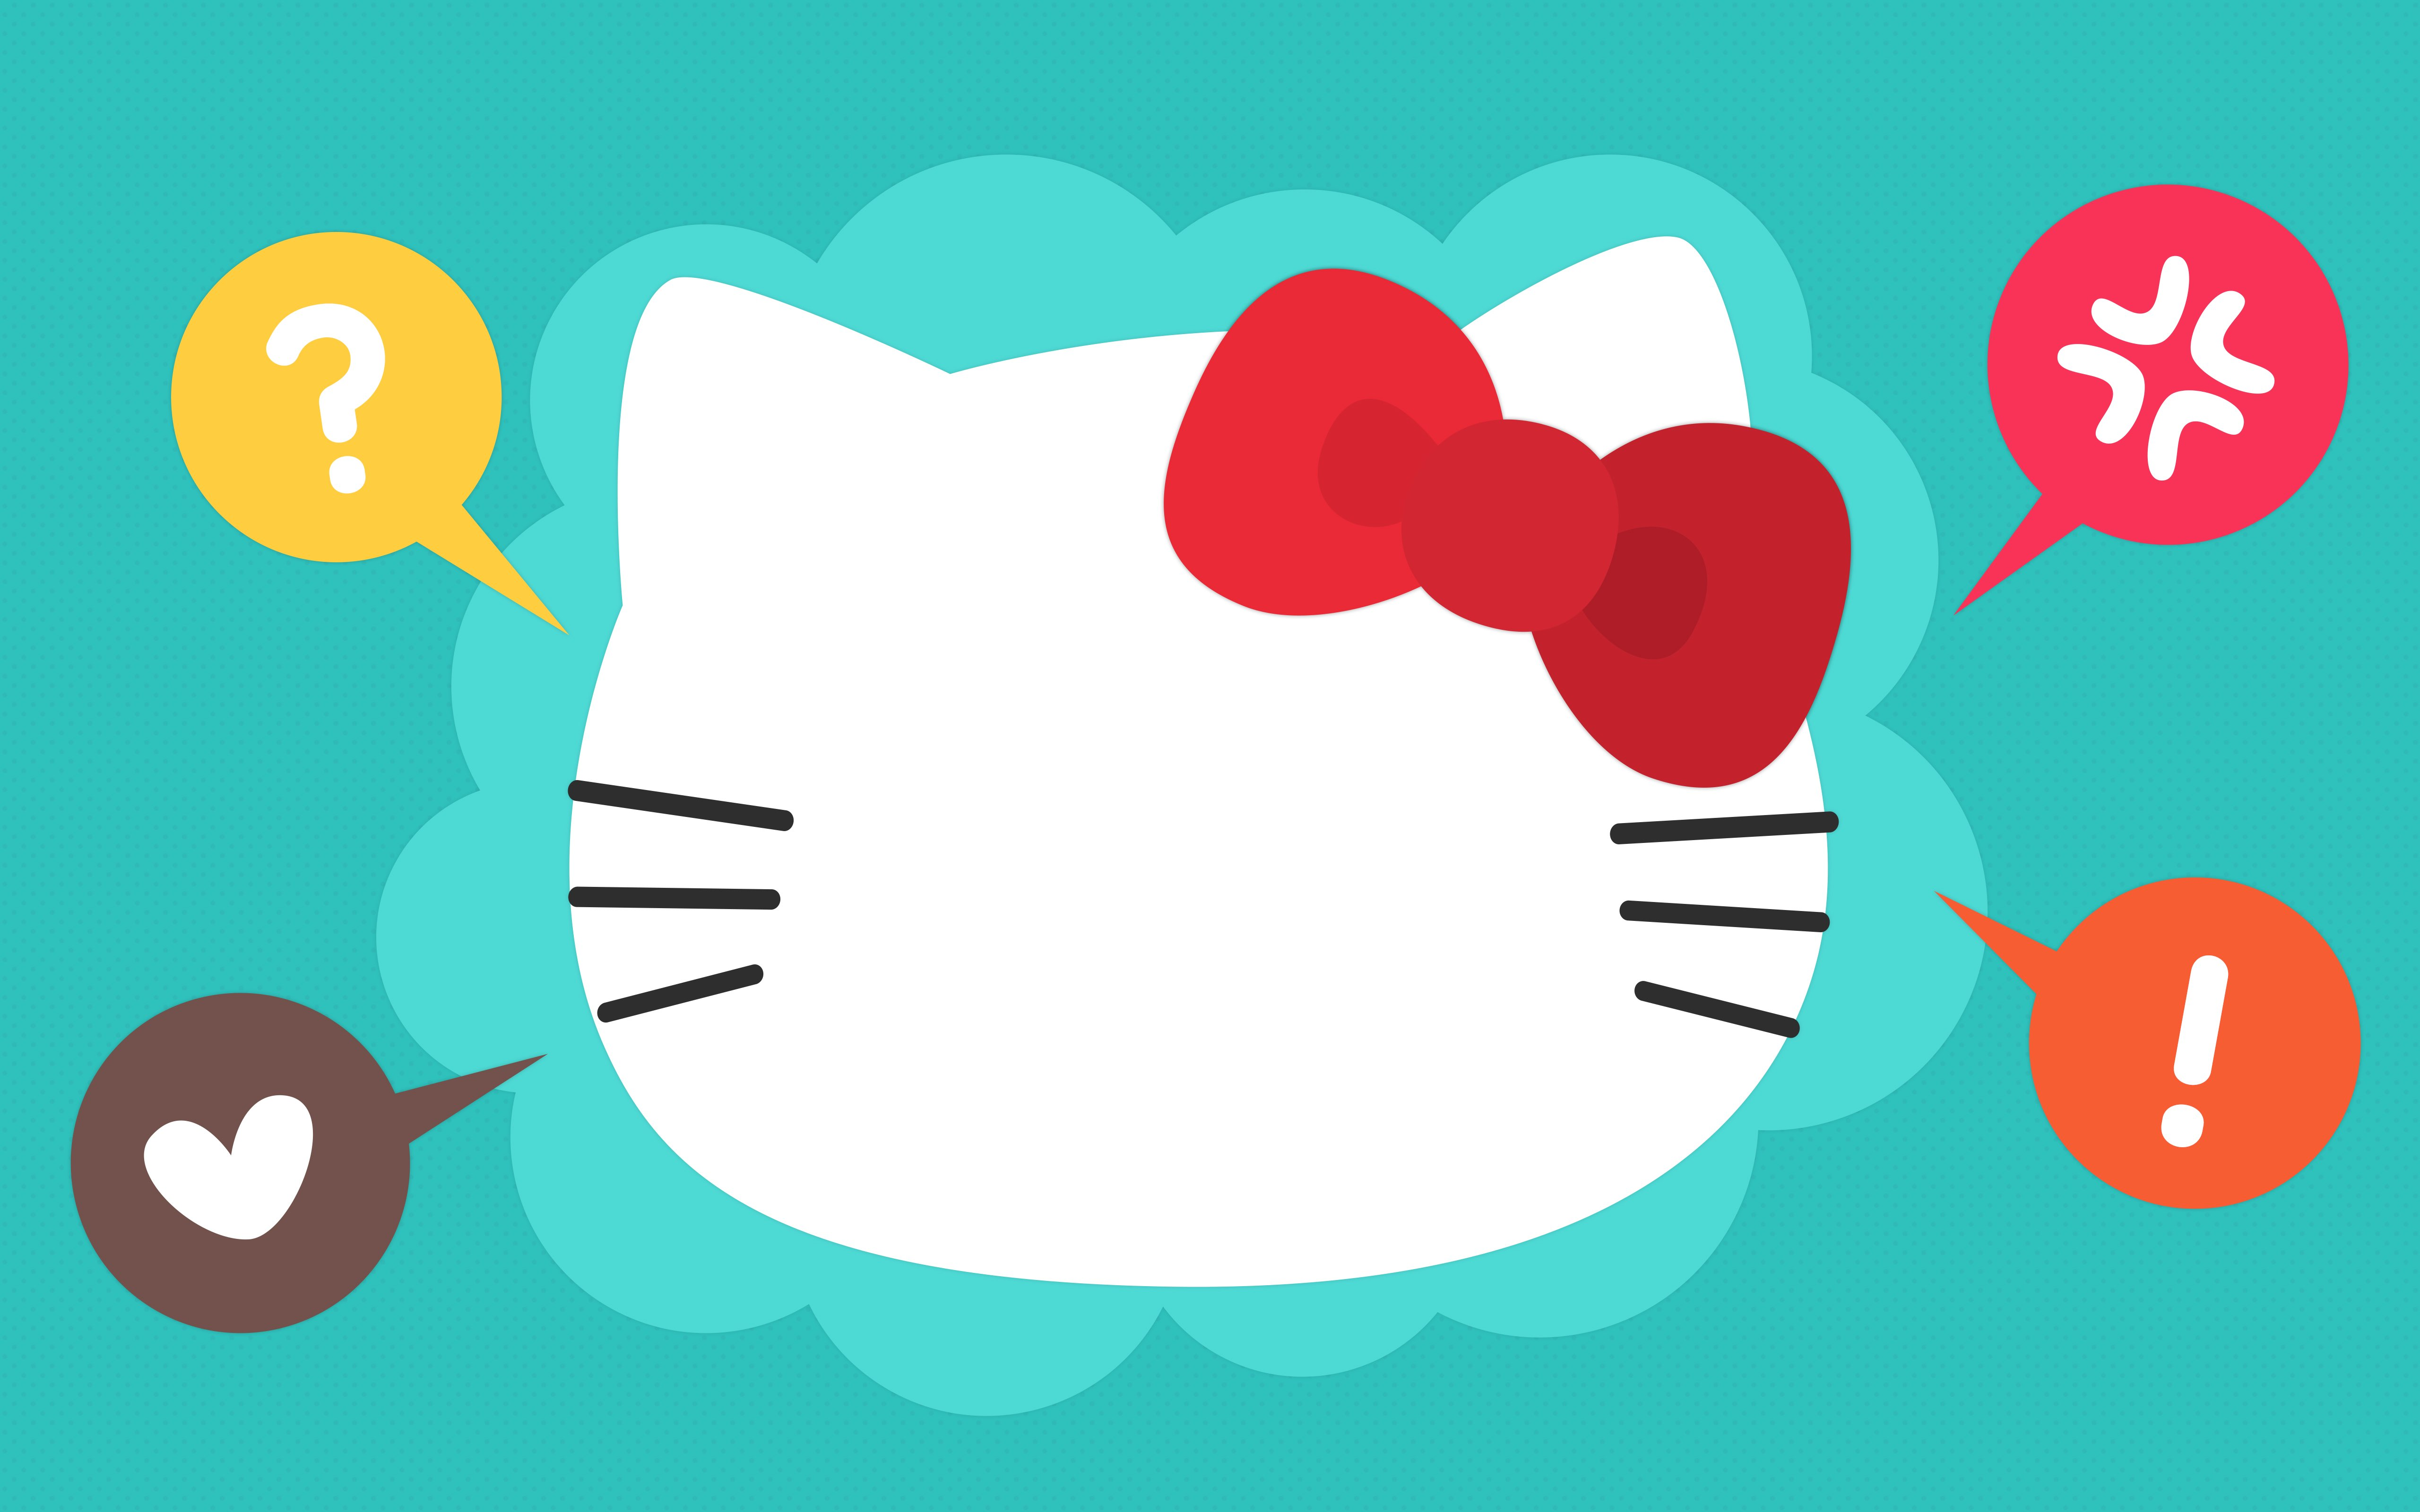 5120x3200 The Secret Behind Hello Kitty's Blank Face